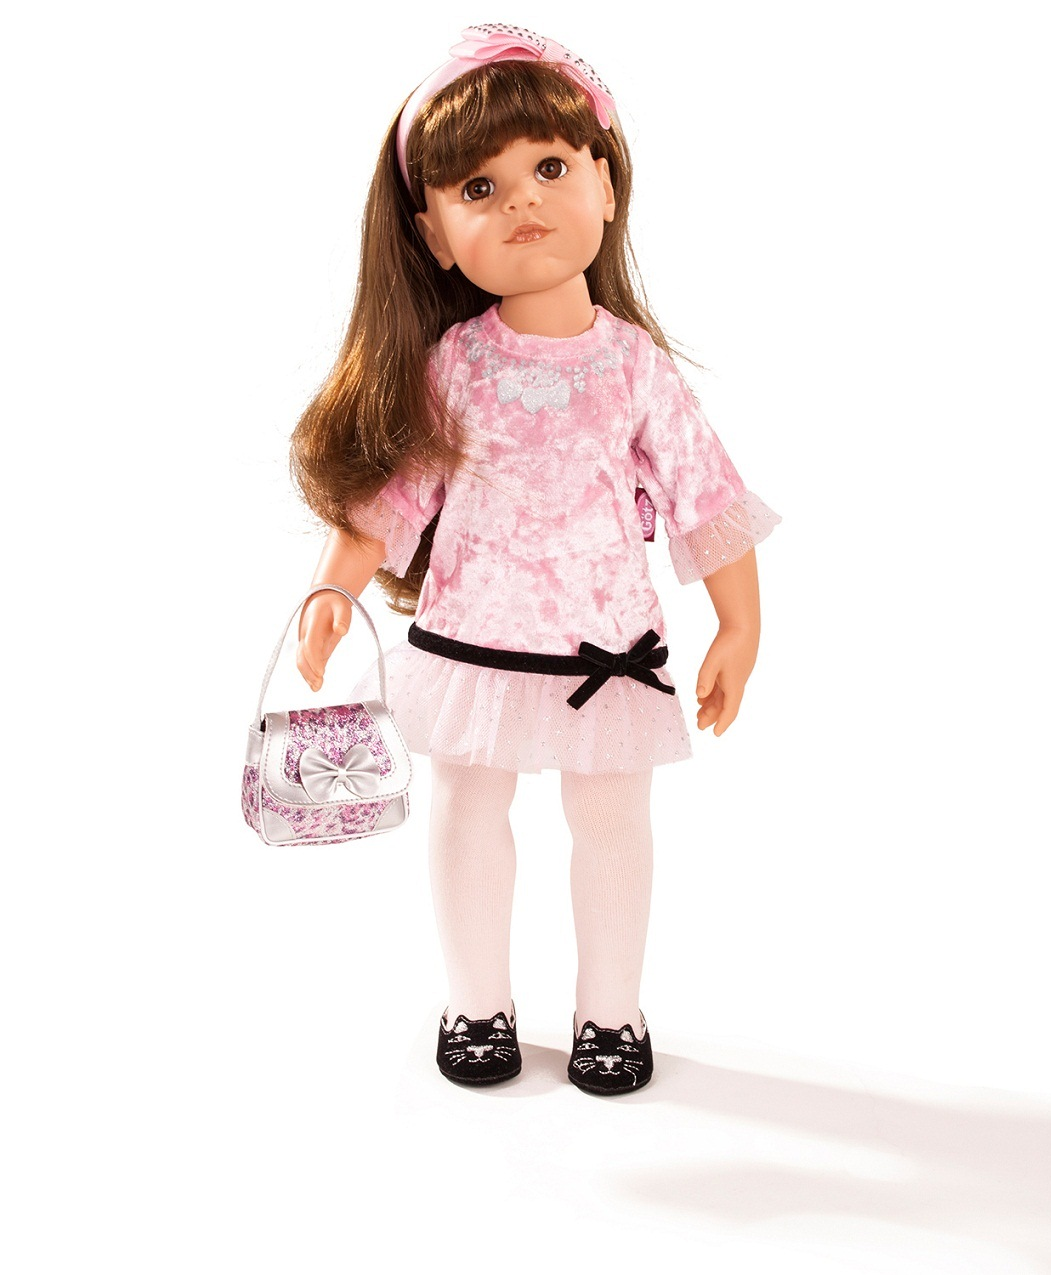 Кукла Ханна-именинница, 50 см от Toyway